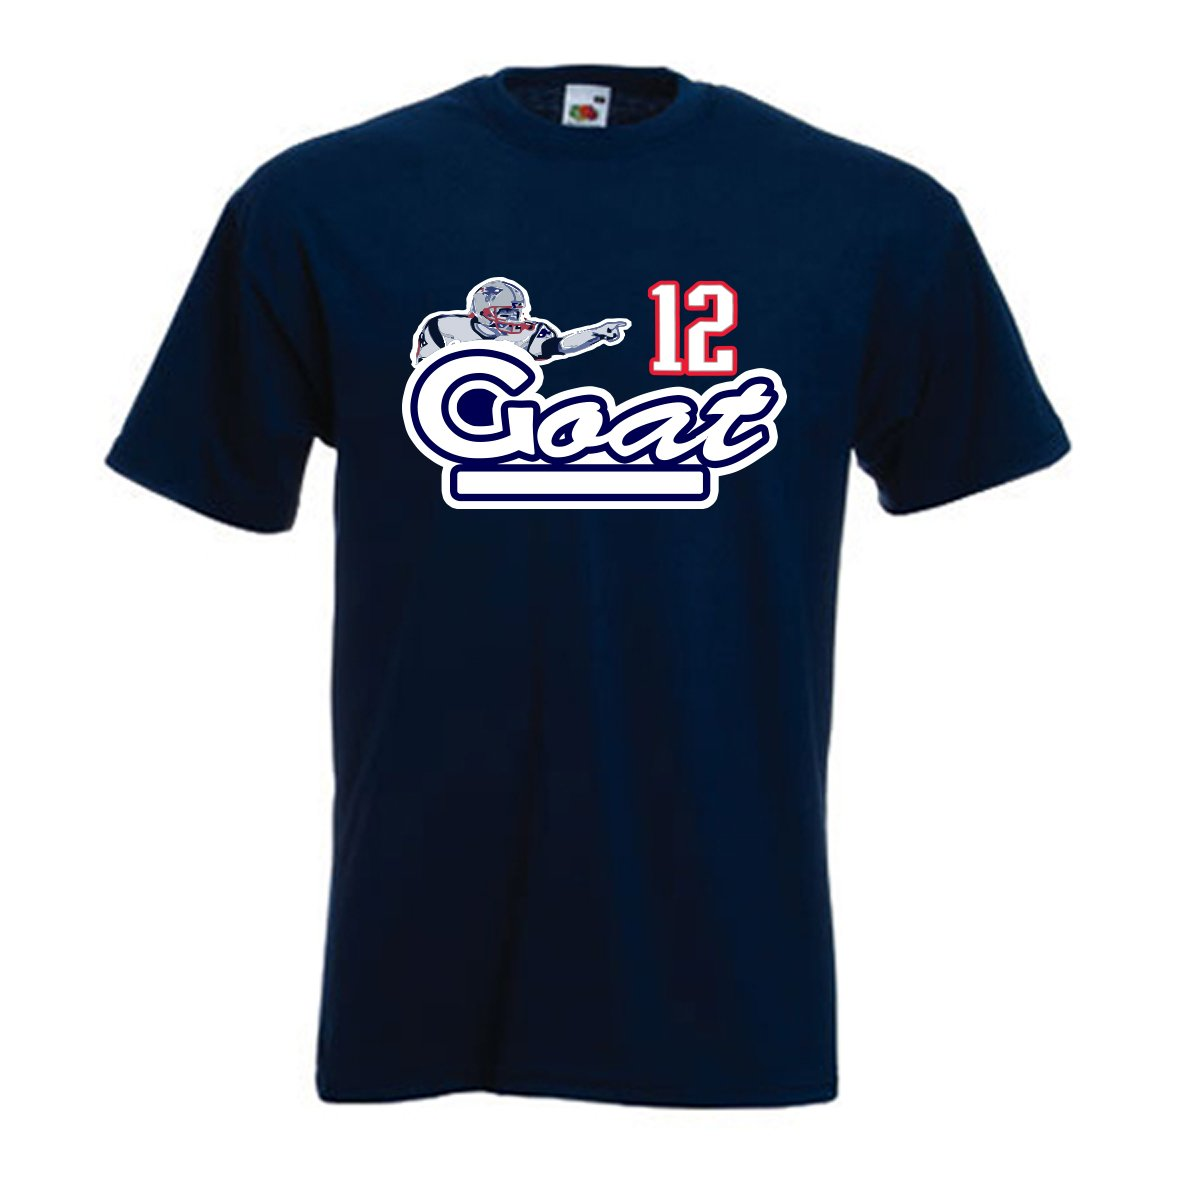 Silo Shirts NAVY Tom Brady New England GOAT T-Shirt 98745